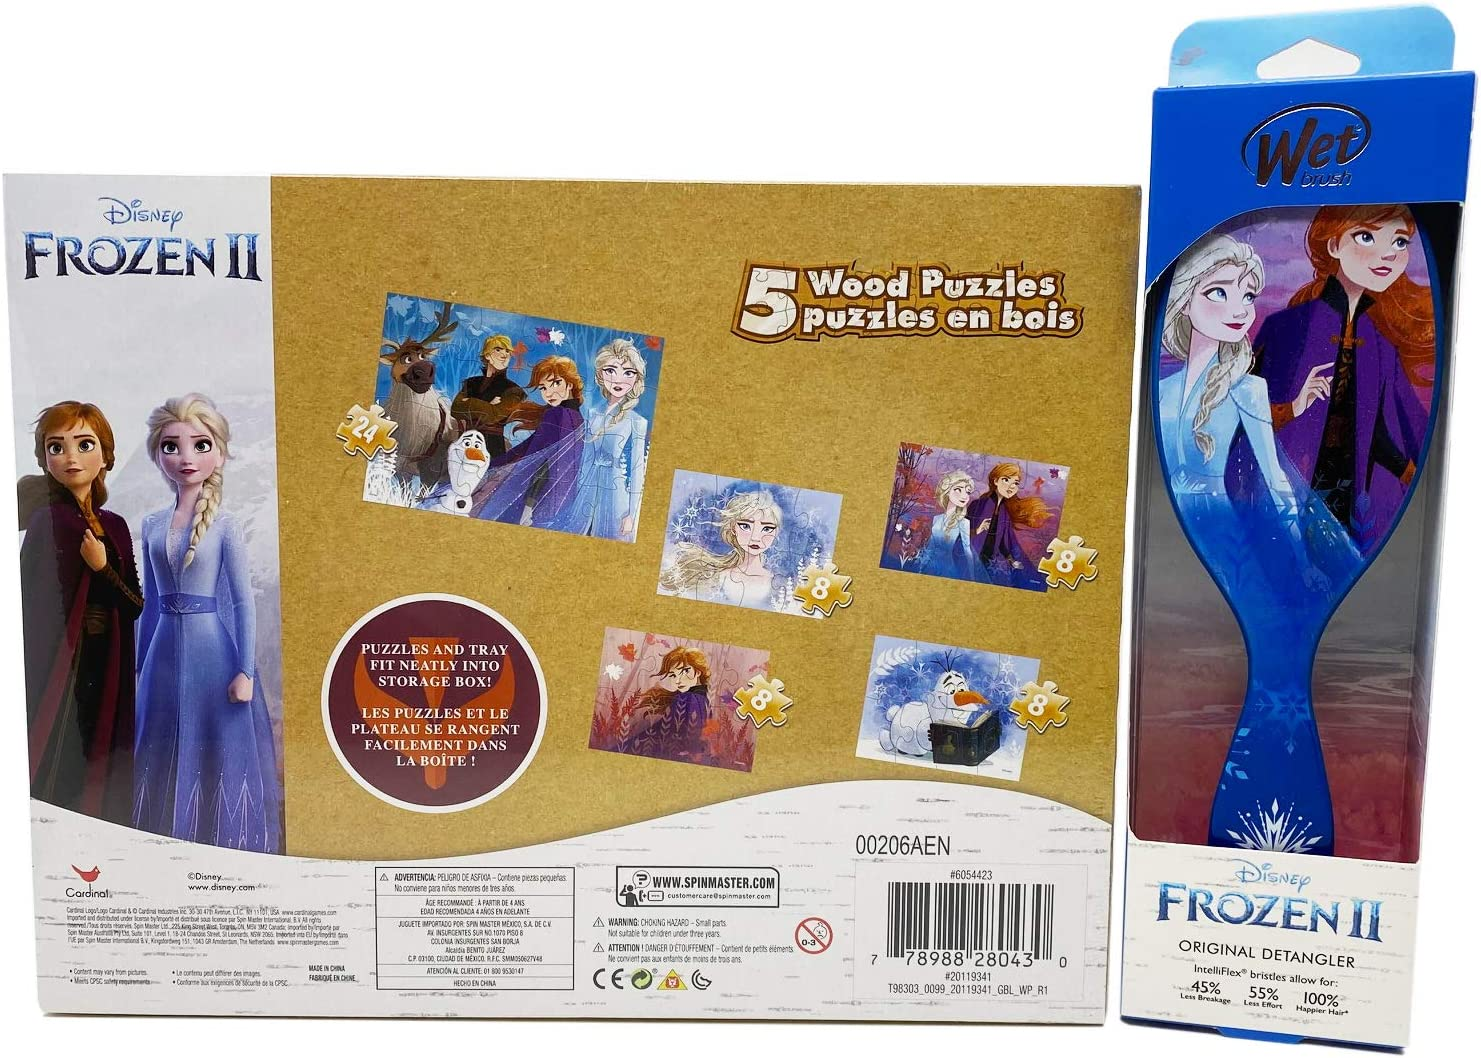 Puzzles for Kids Ages 3-5 Anna /& Elsa 5 Wood Puzzles in Storage Box /& Disney Wet Brush Original Detangler Disney Frozen 2 Puzzle /& Wet Brush Detangler Bundle